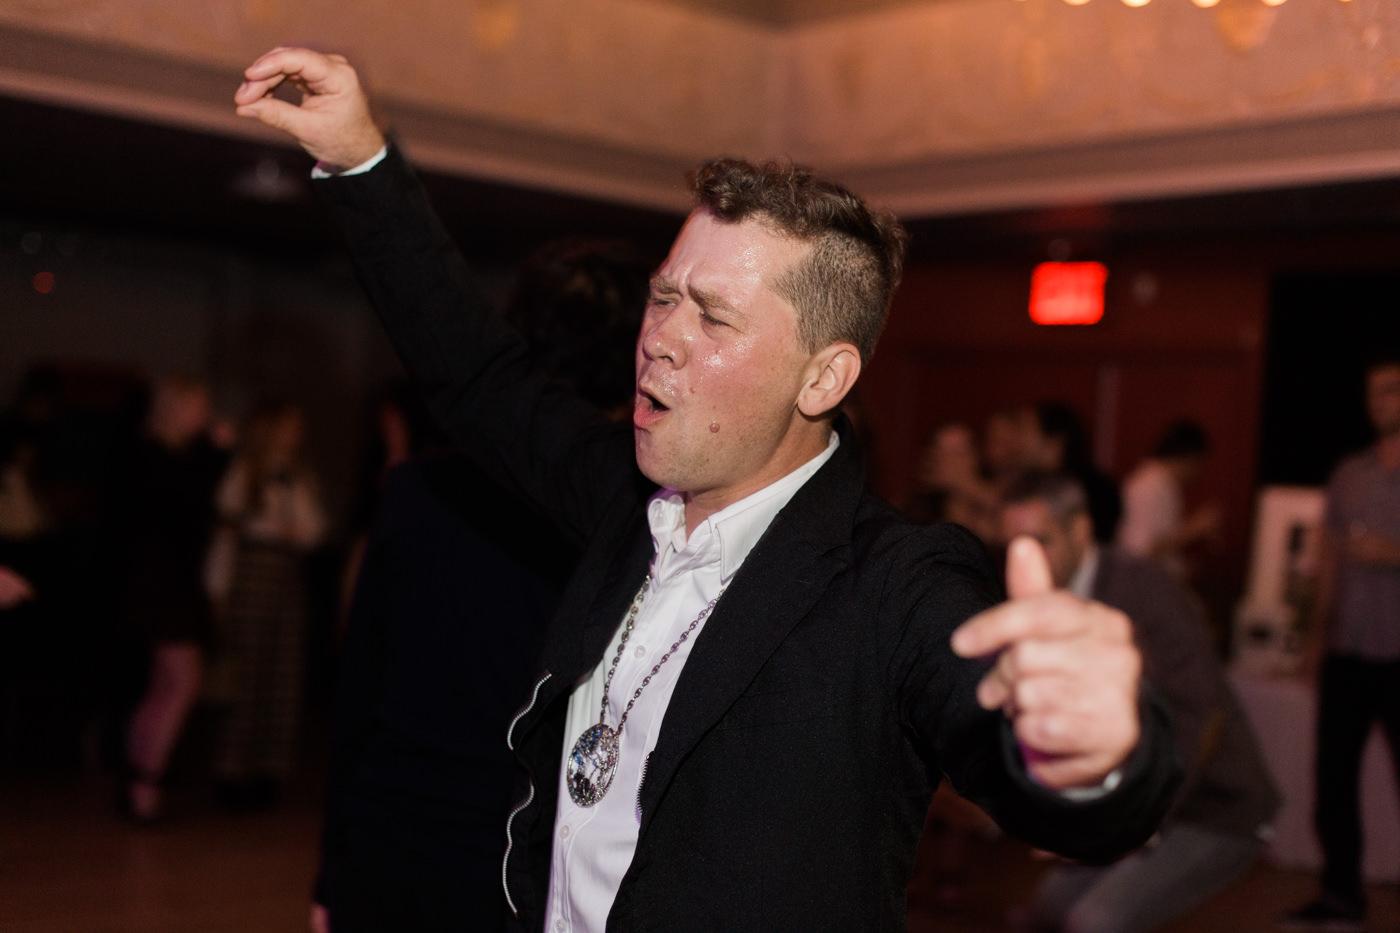 Mt Tremper Arts Gala -  NYC event photographer Kamp Weddings-34.jpg